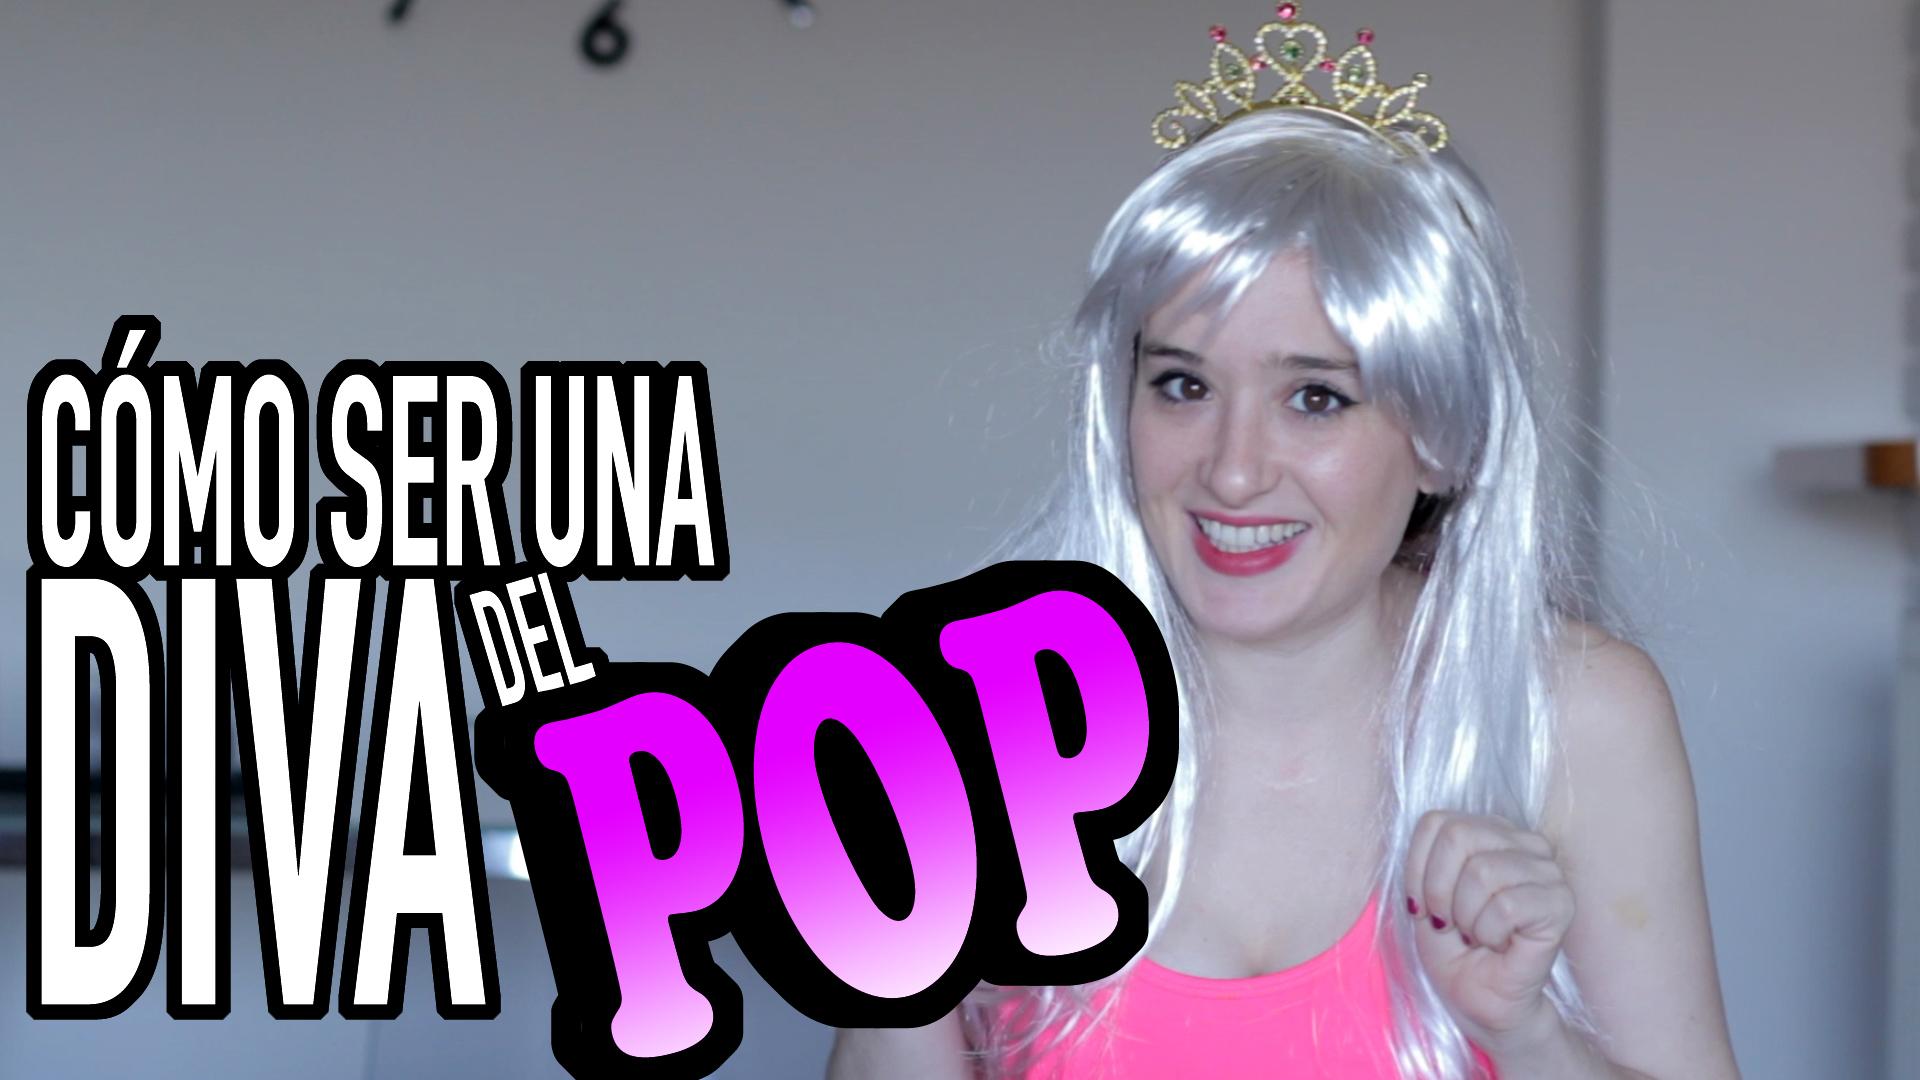 Temporada 1 Cómo ser una DIVA DEL POP - Soy una chica fitness | Living Postureo